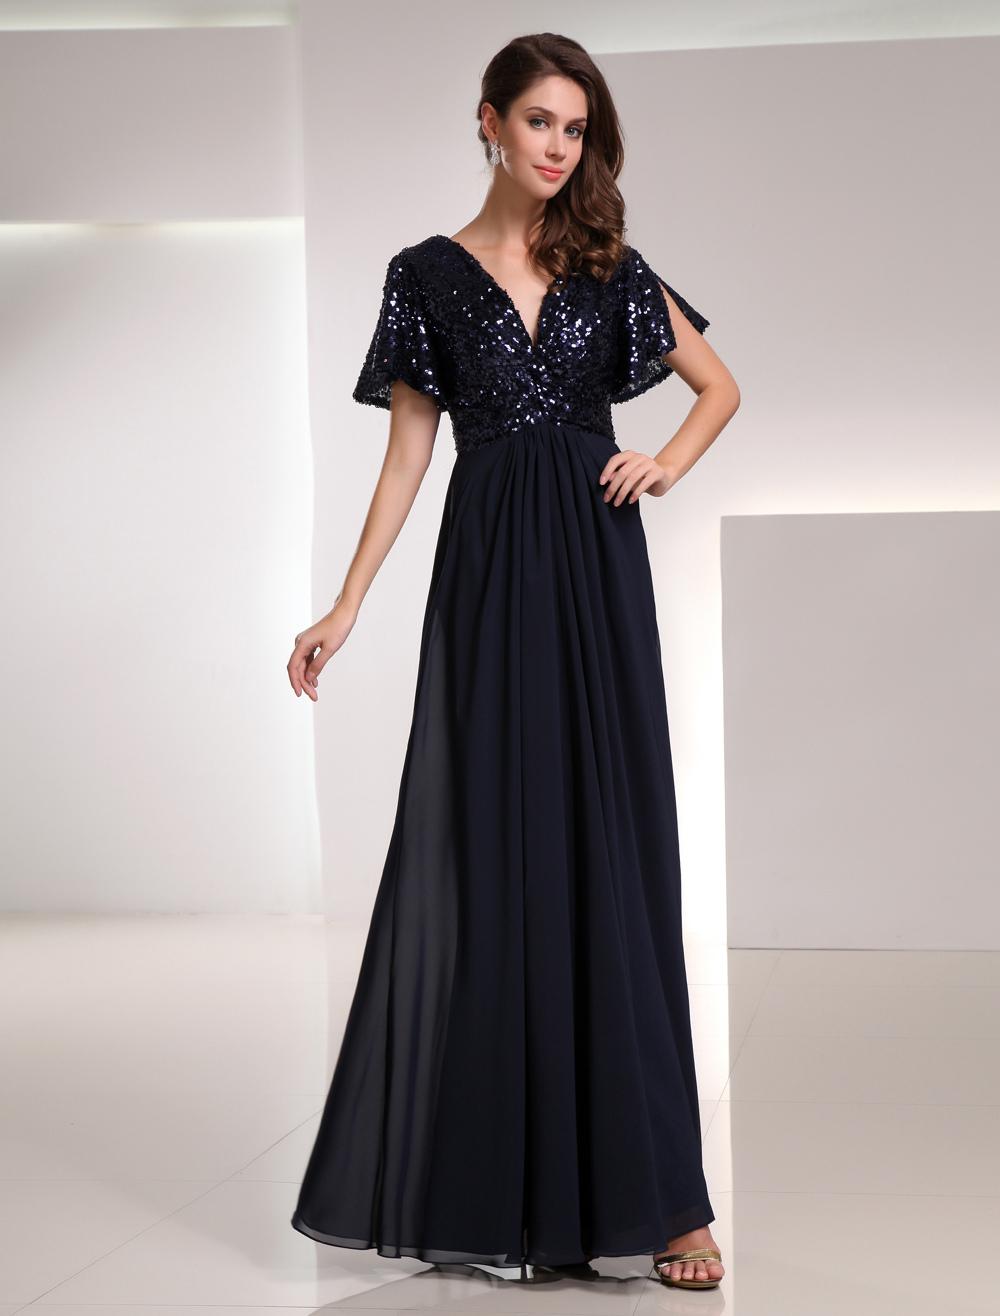 Dark Navy Bridesmaid Dress Sequins Backless Chiffon Dress